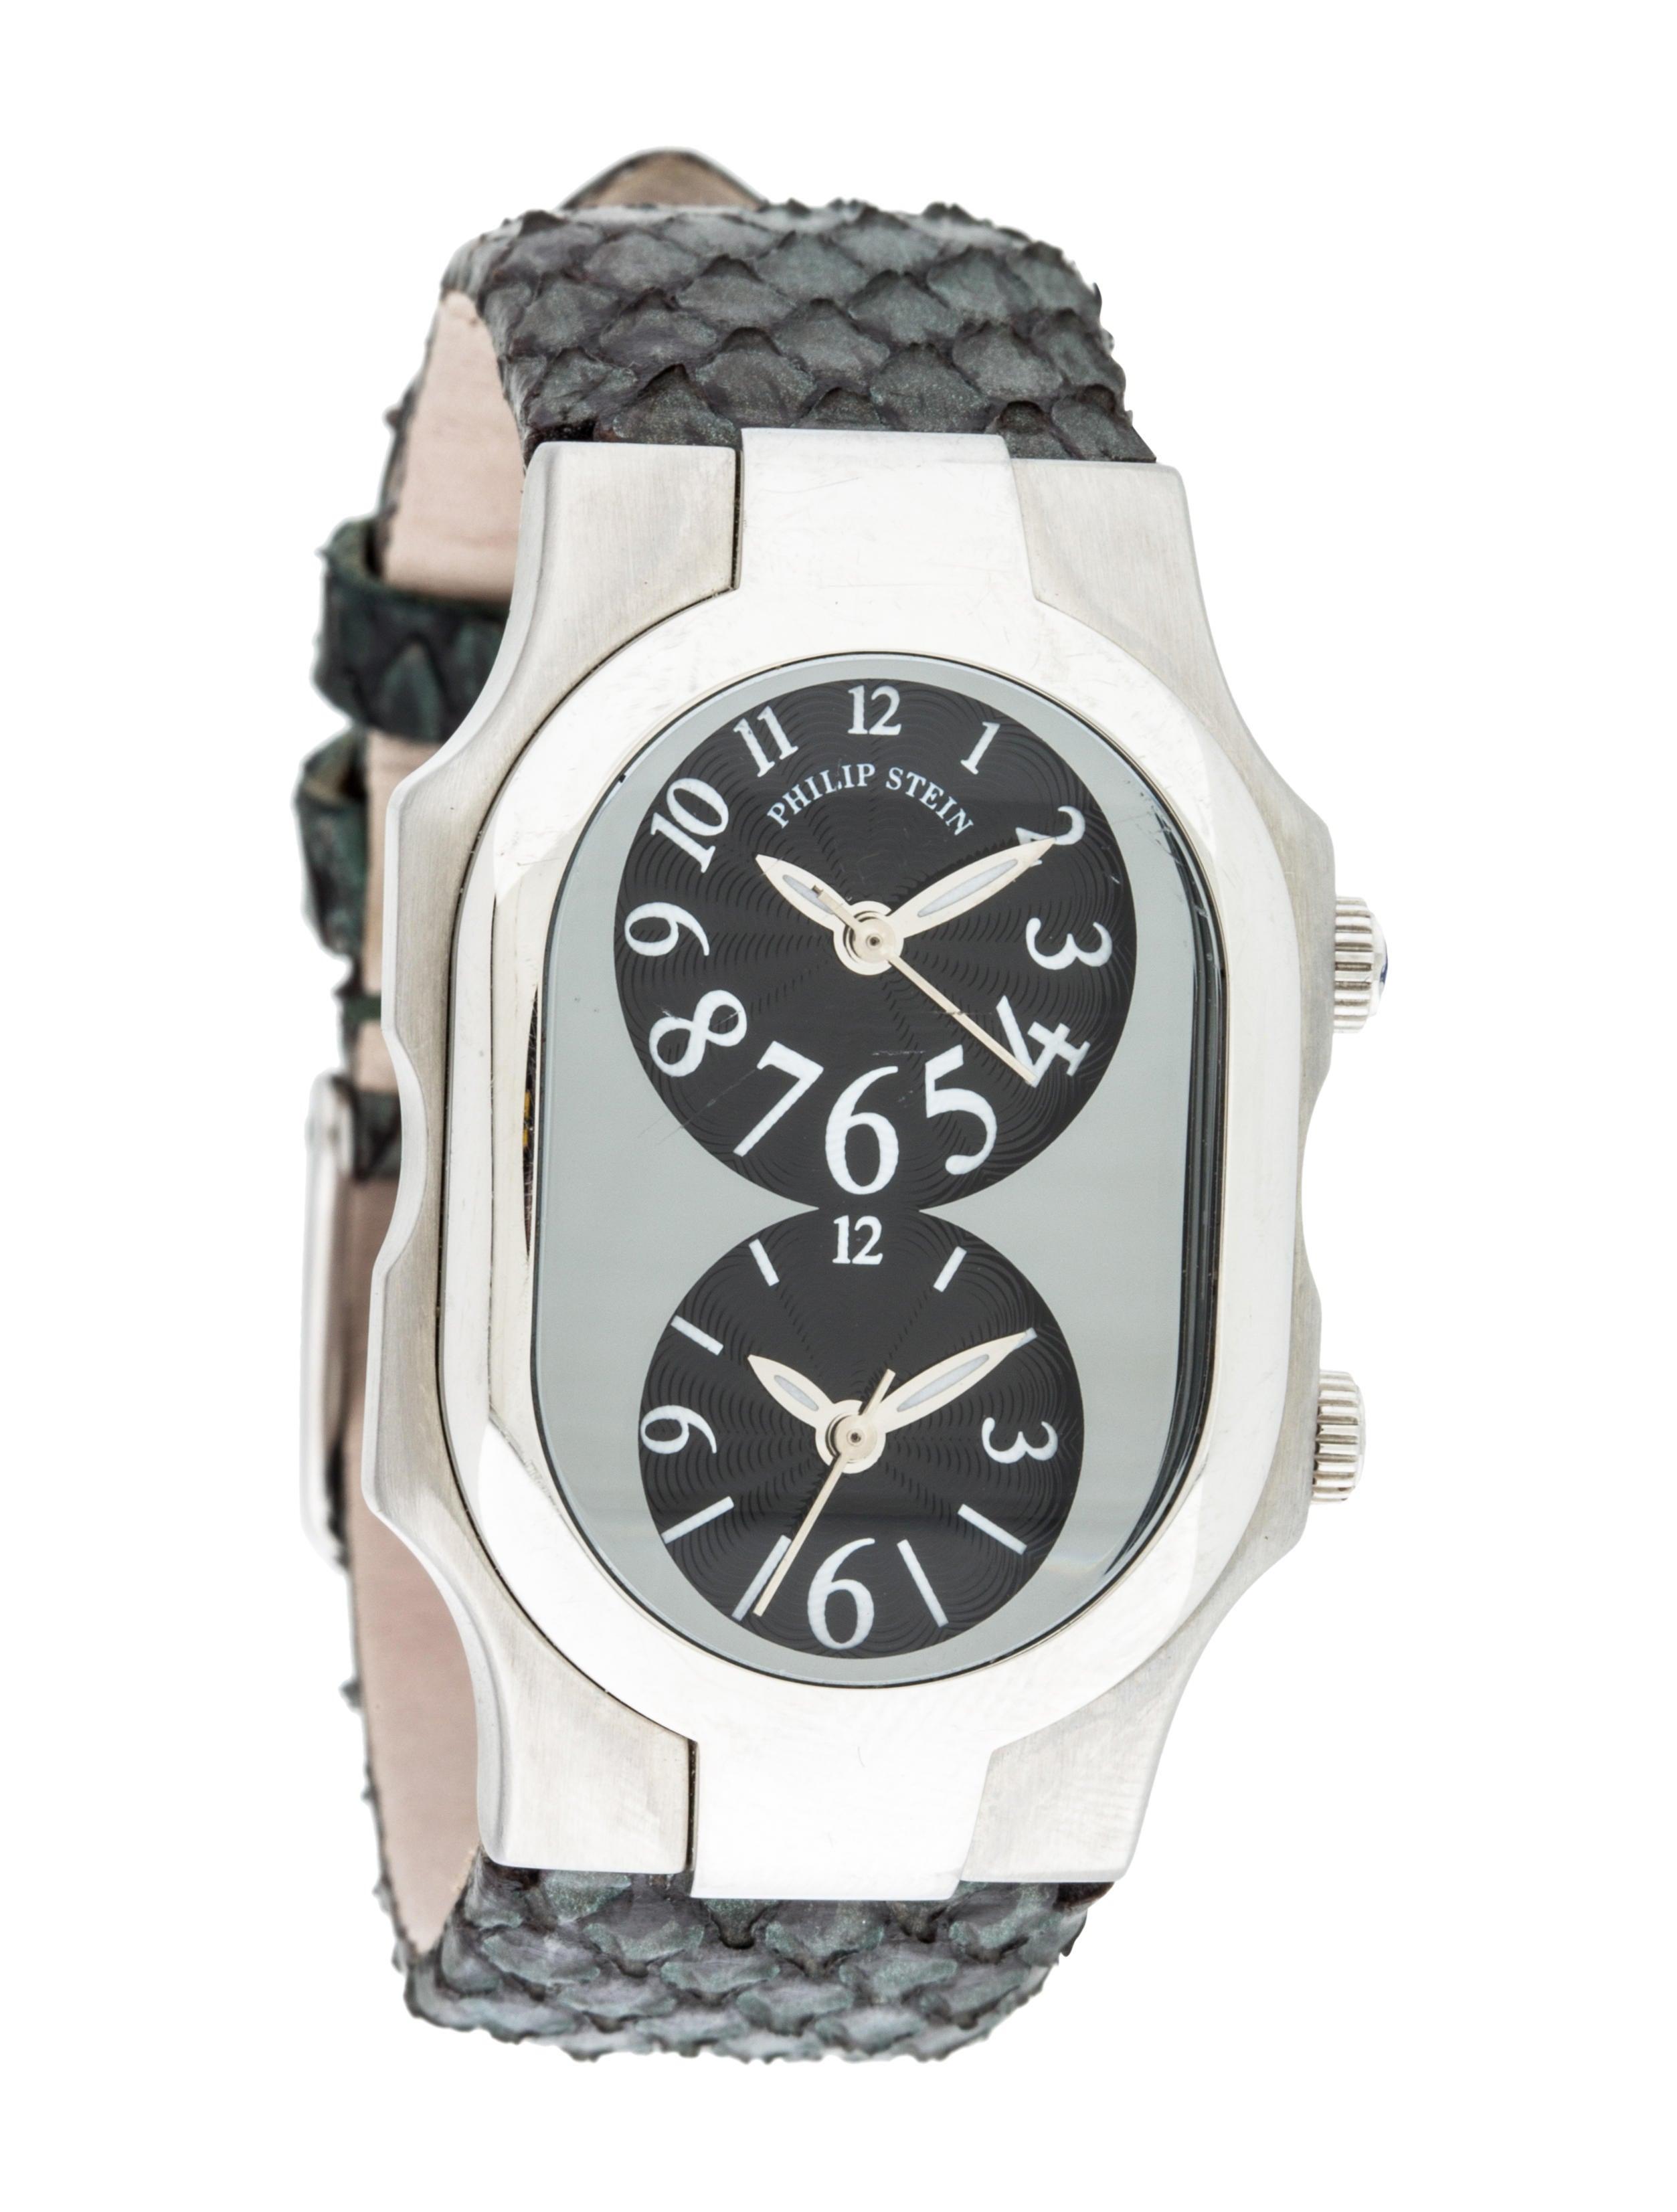 Philip stein signature watch strap phs20640 the realreal for Philip stein watches